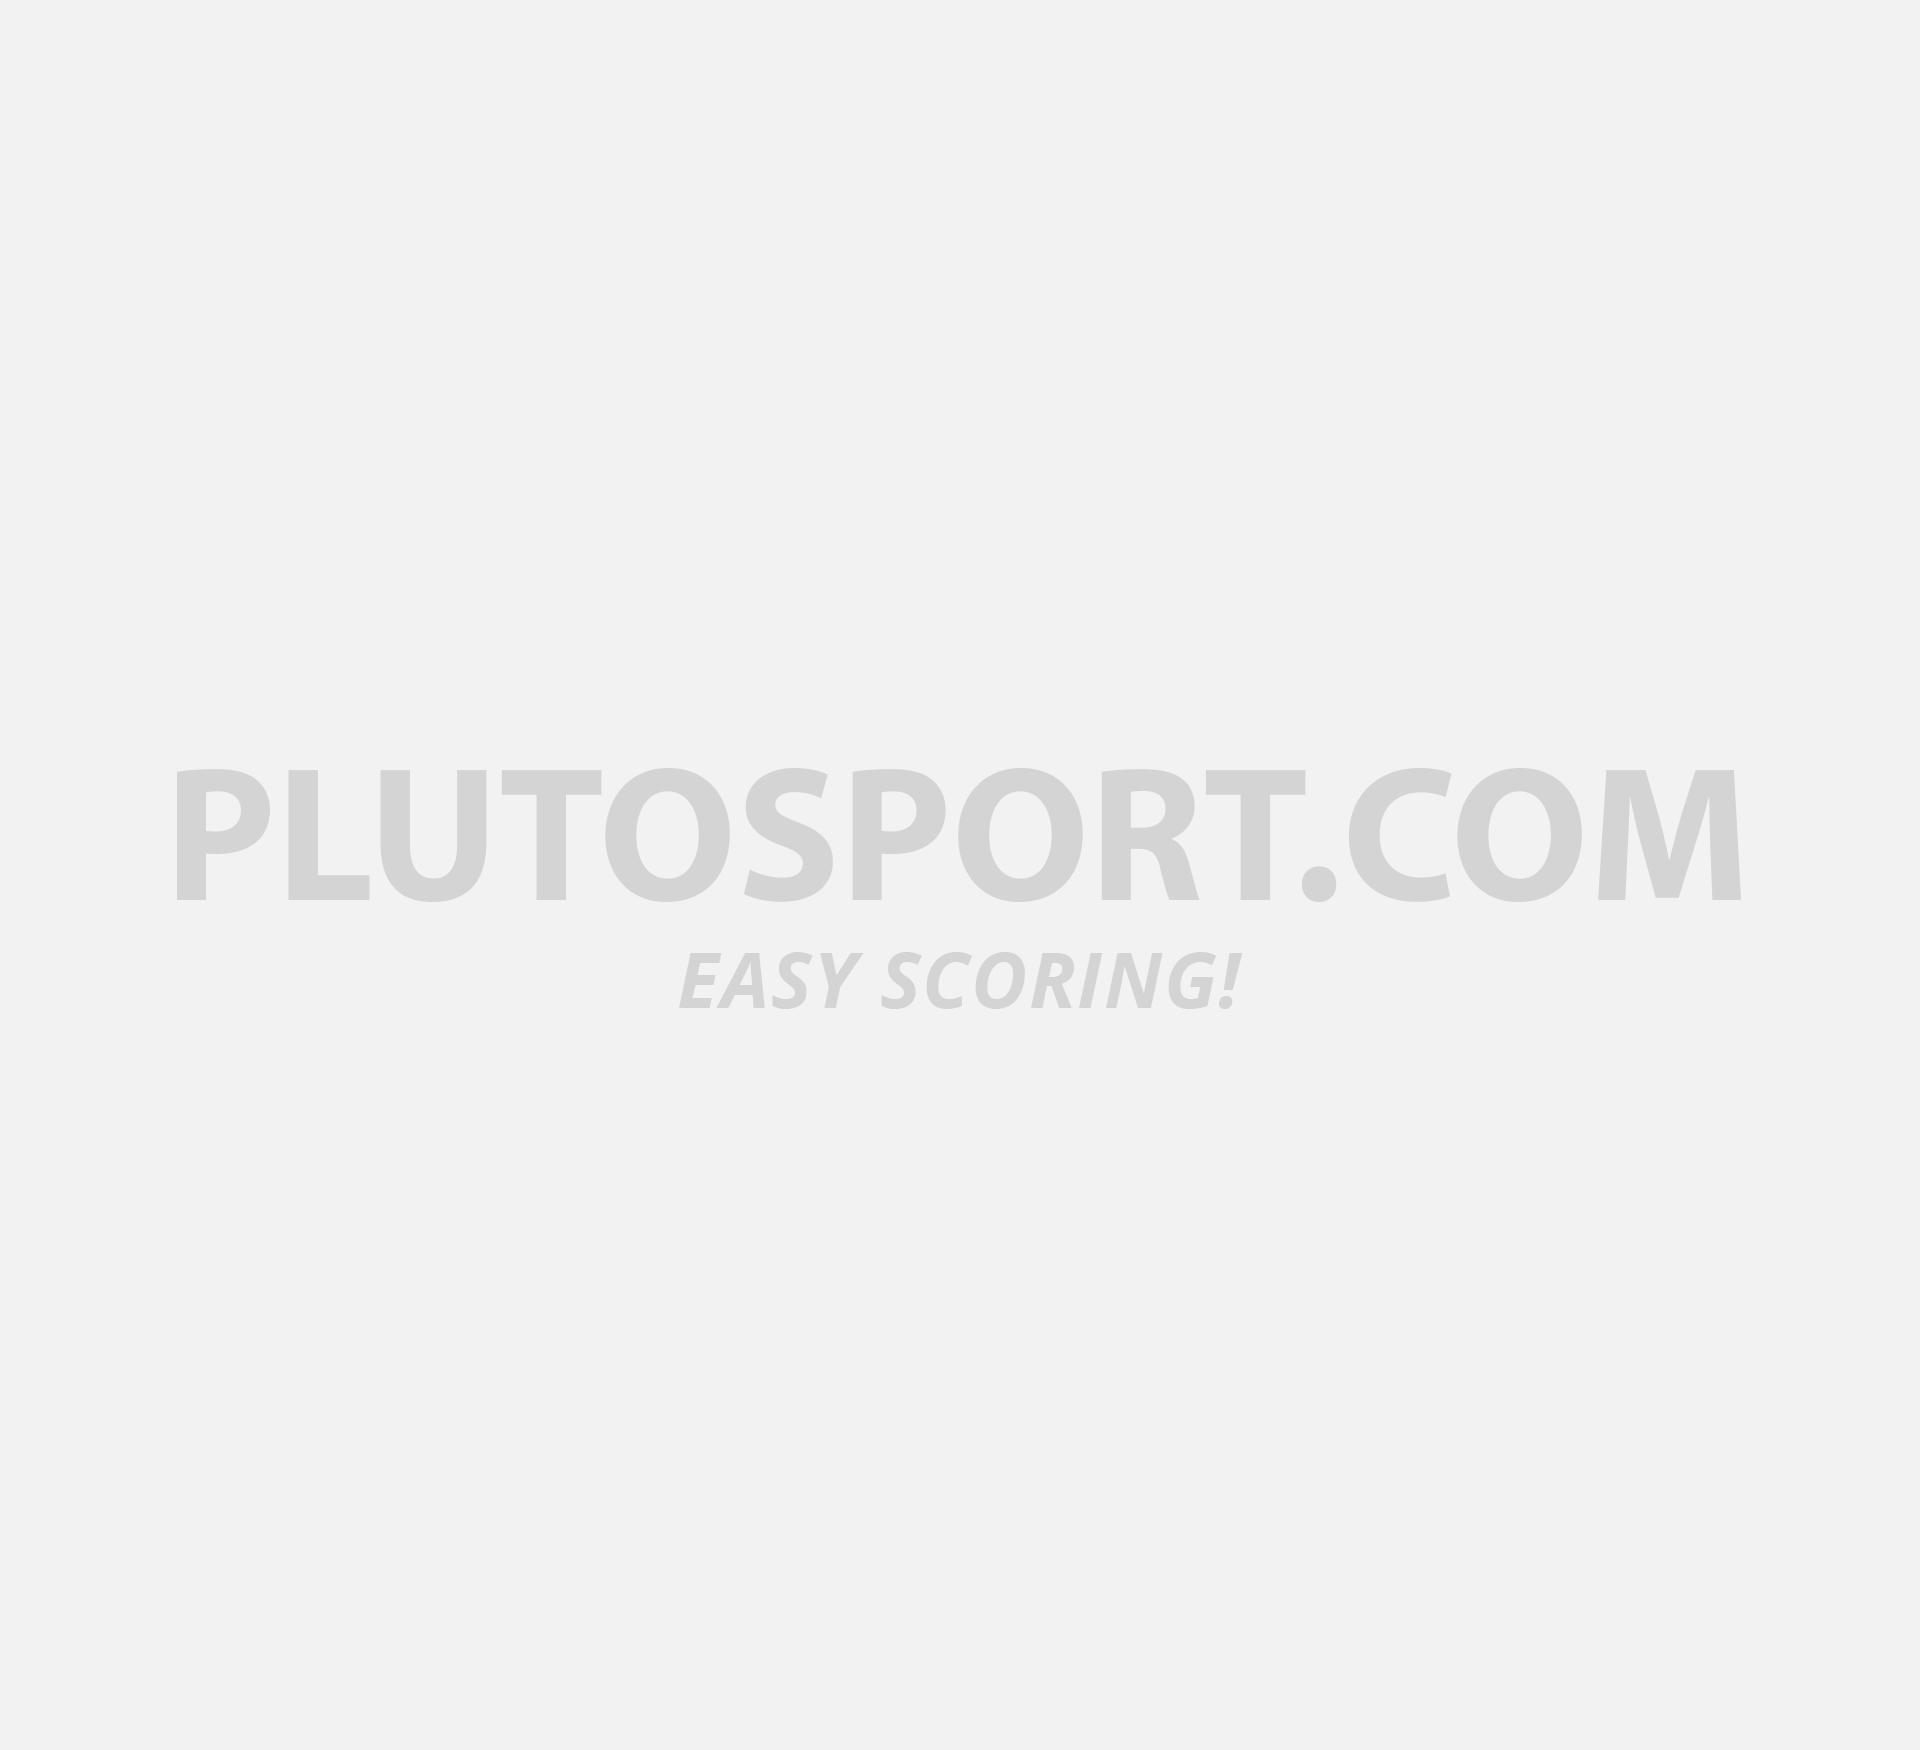 Asics Gel-Solution Speed 3 Clay - Gravel - Shoes - Tennis - Sports ... 13bfcdbdec5